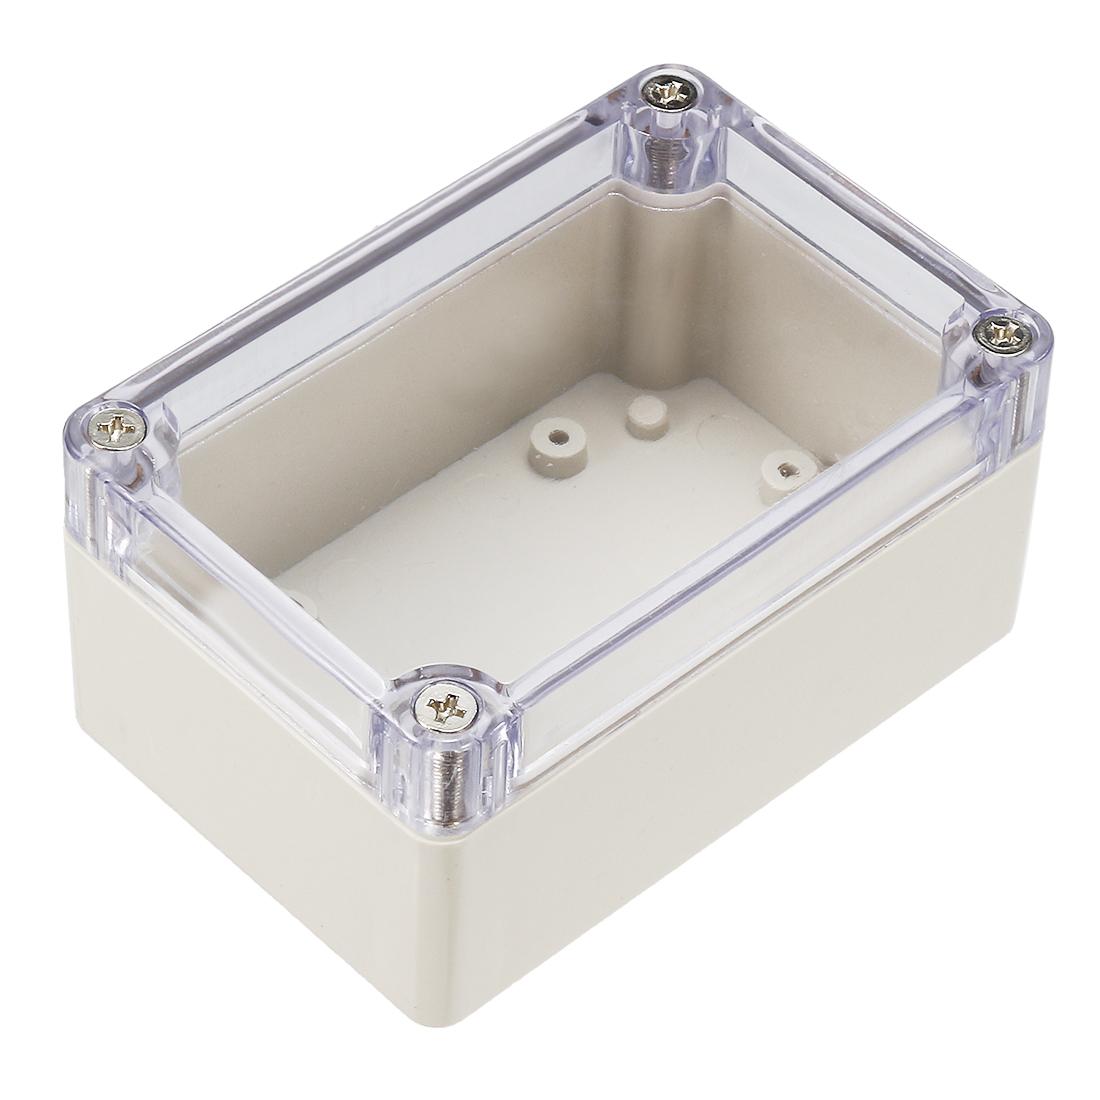 2pcs 100mm x 70mm x 50mm Clear Plastic Enclosure Case DIY Junction Box